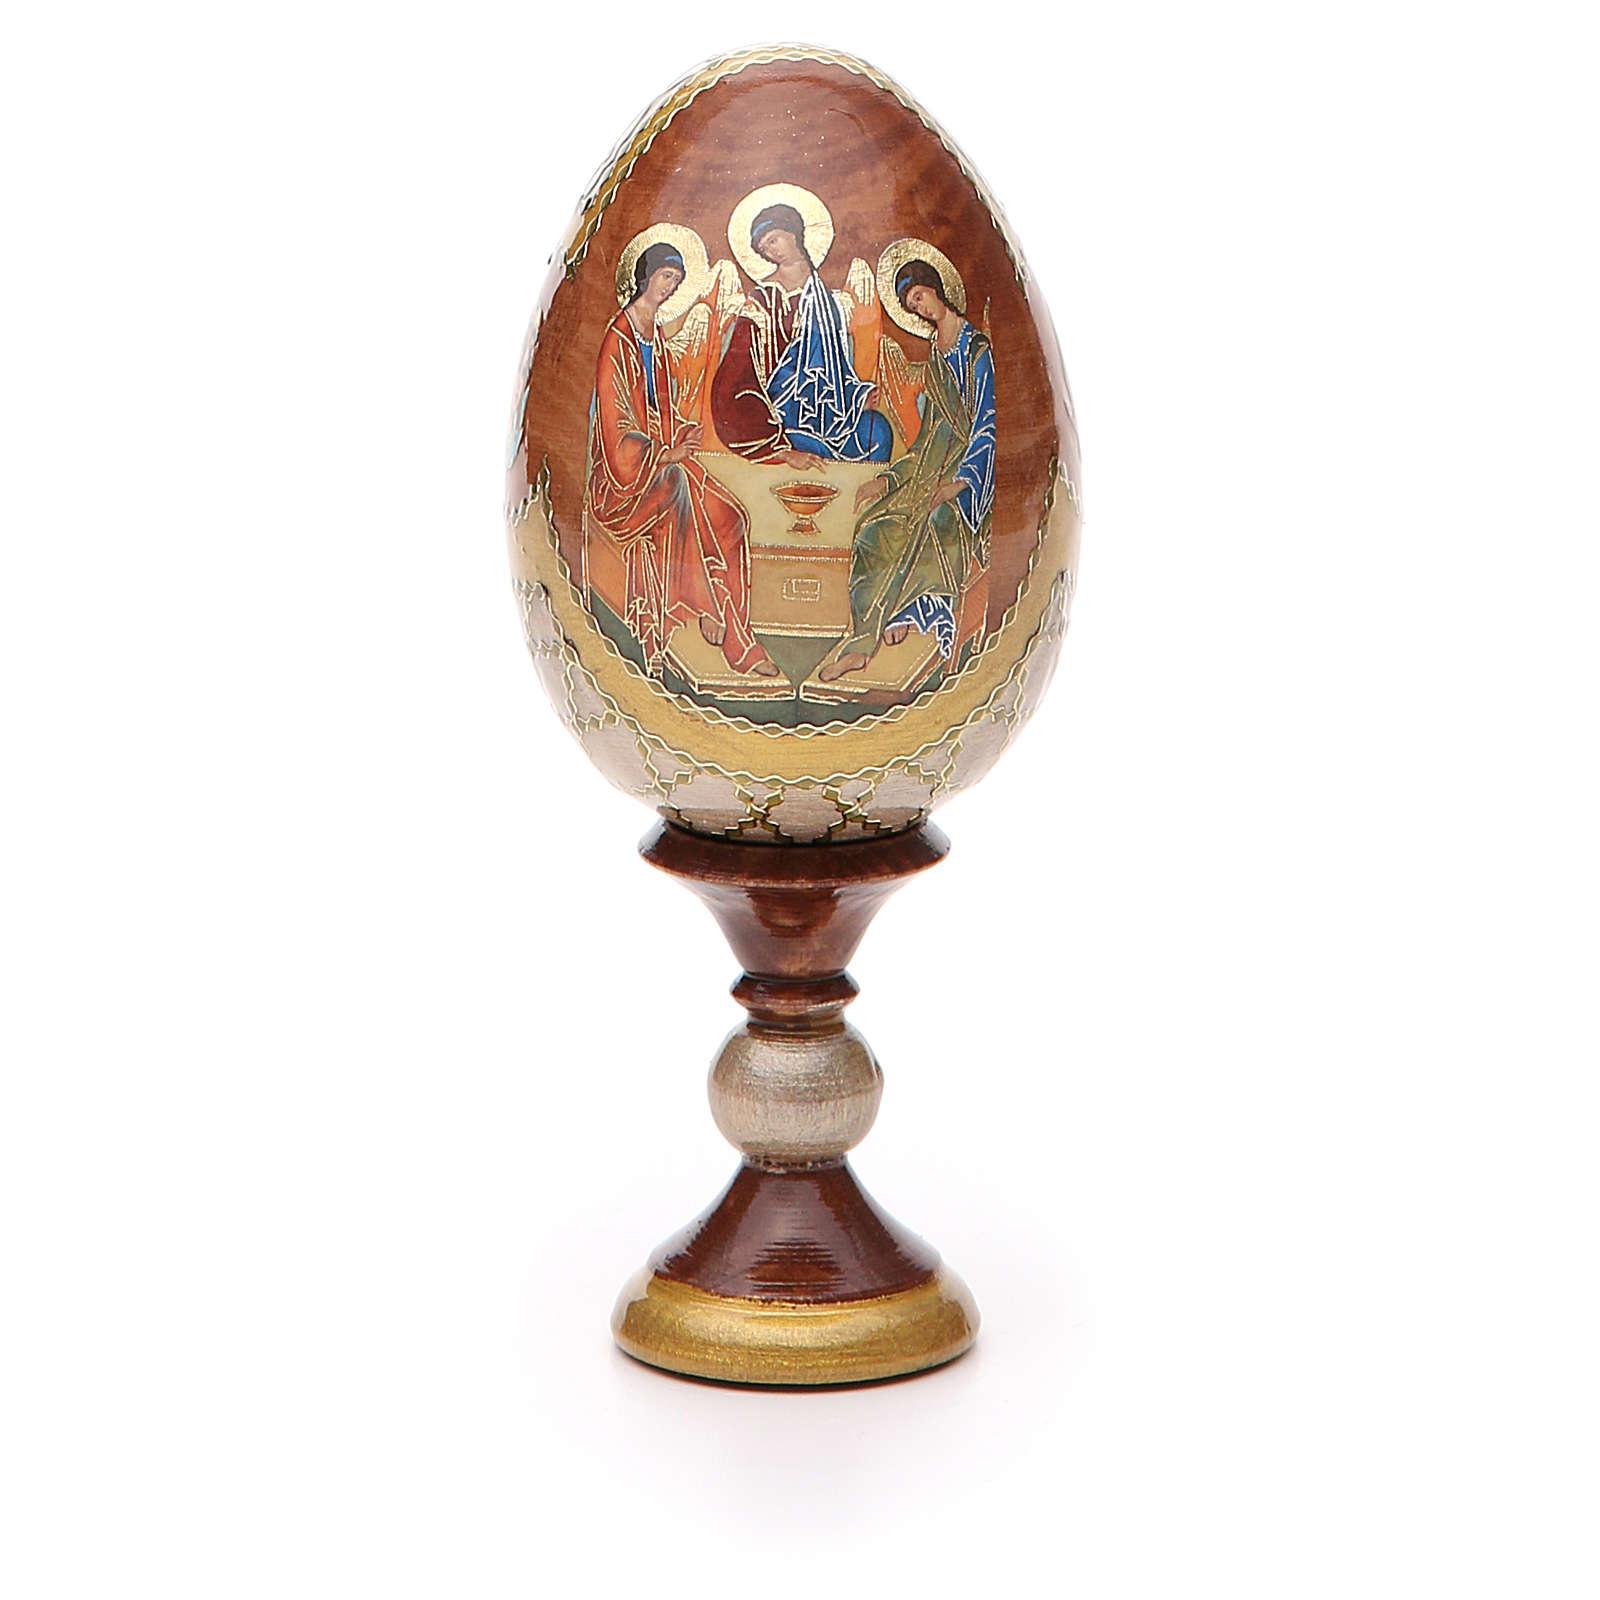 Uovo icona russa découpage Trinità Rublev h tot. 13 cm stile Fabergé 4